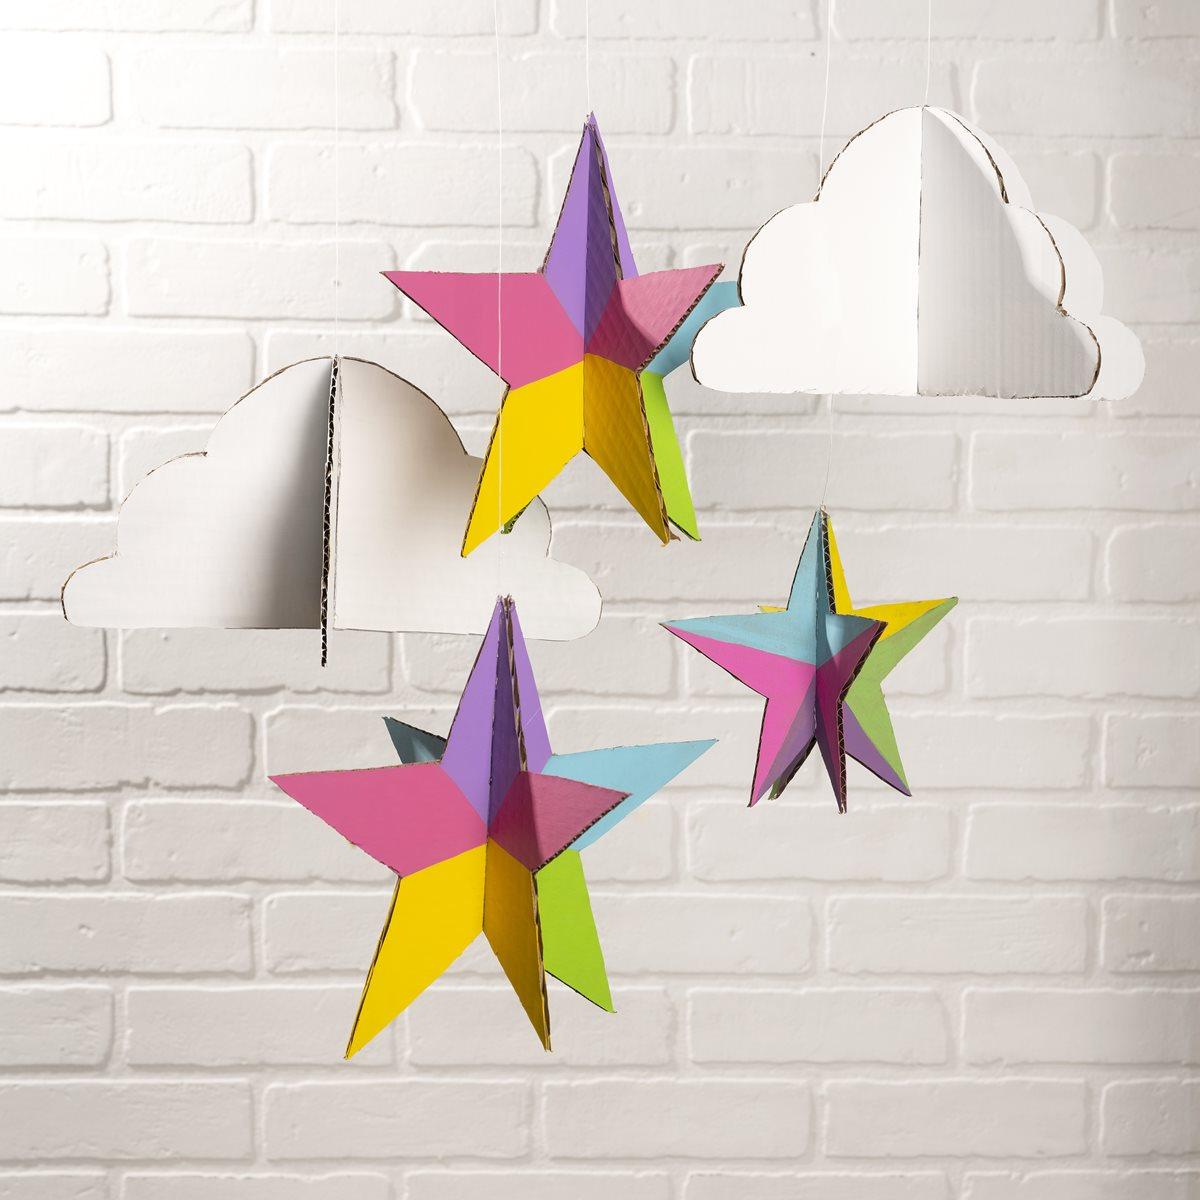 Cardboard Clouds and Stars